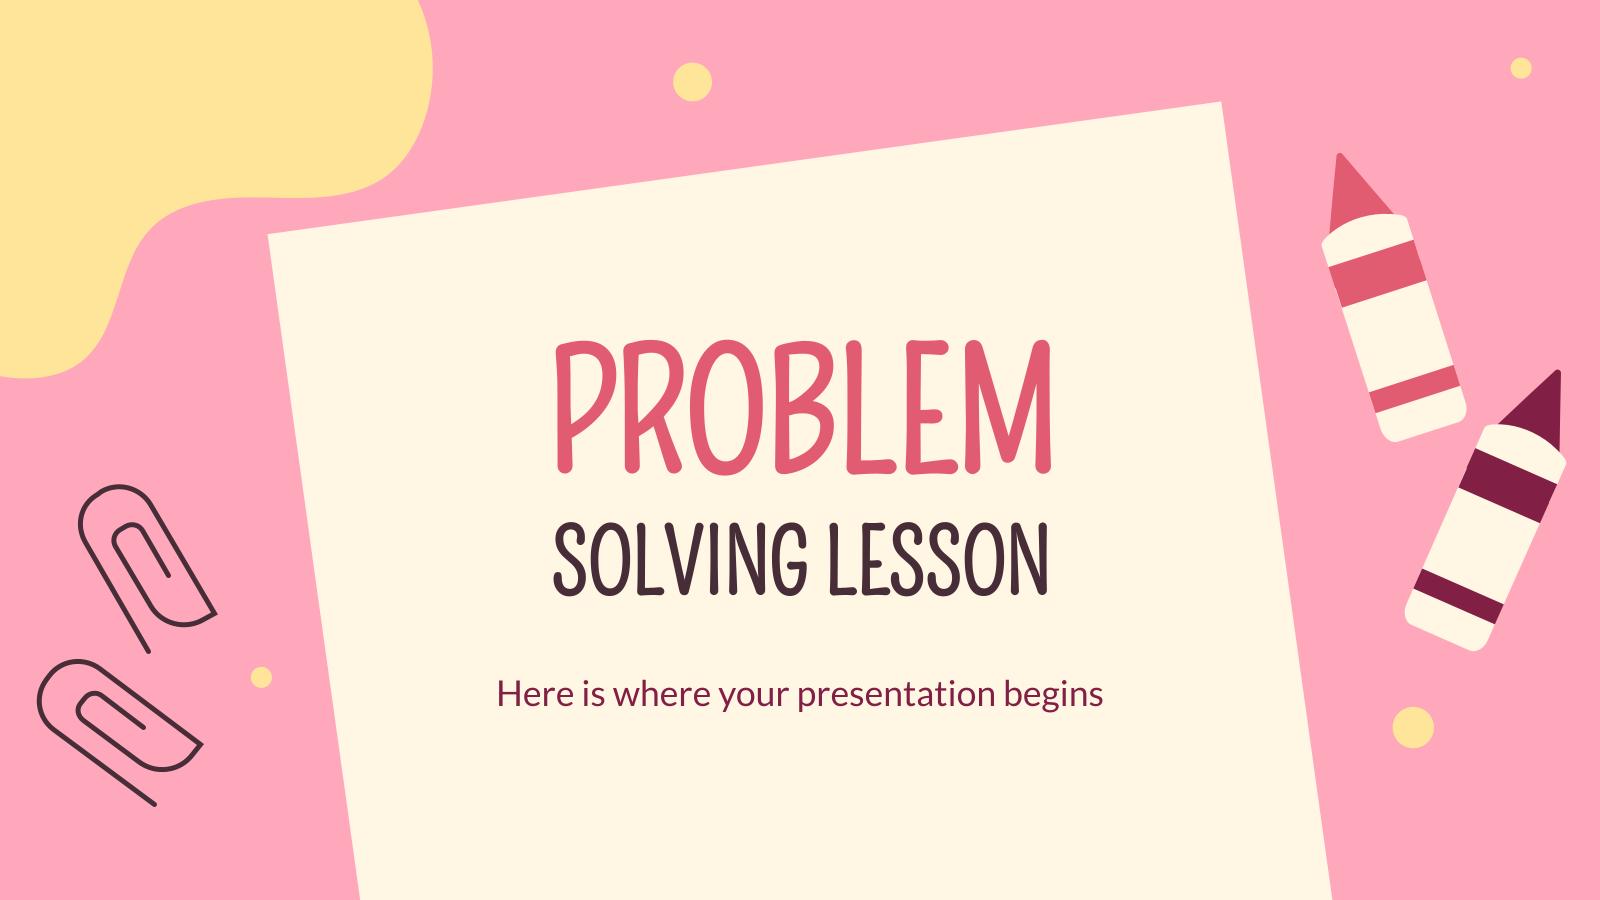 Plantilla de presentación Lección básica